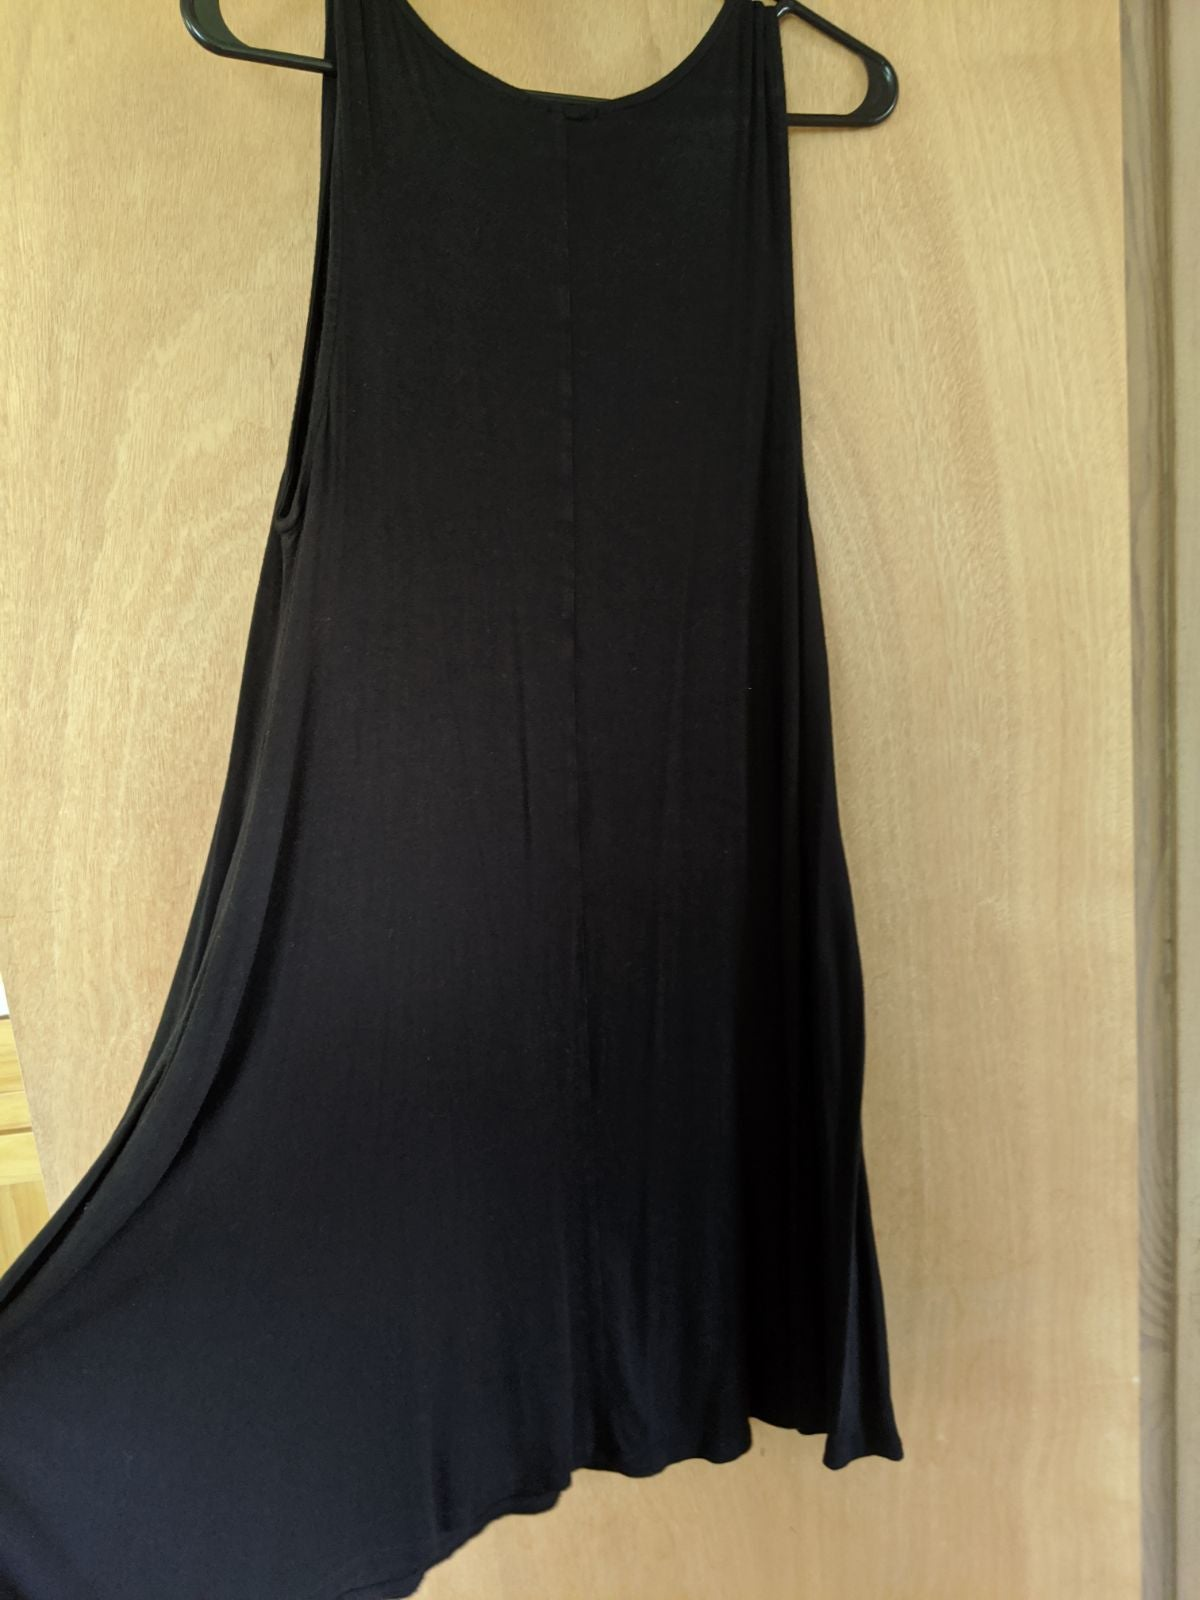 Black Hourglass Lily sleeveless dress